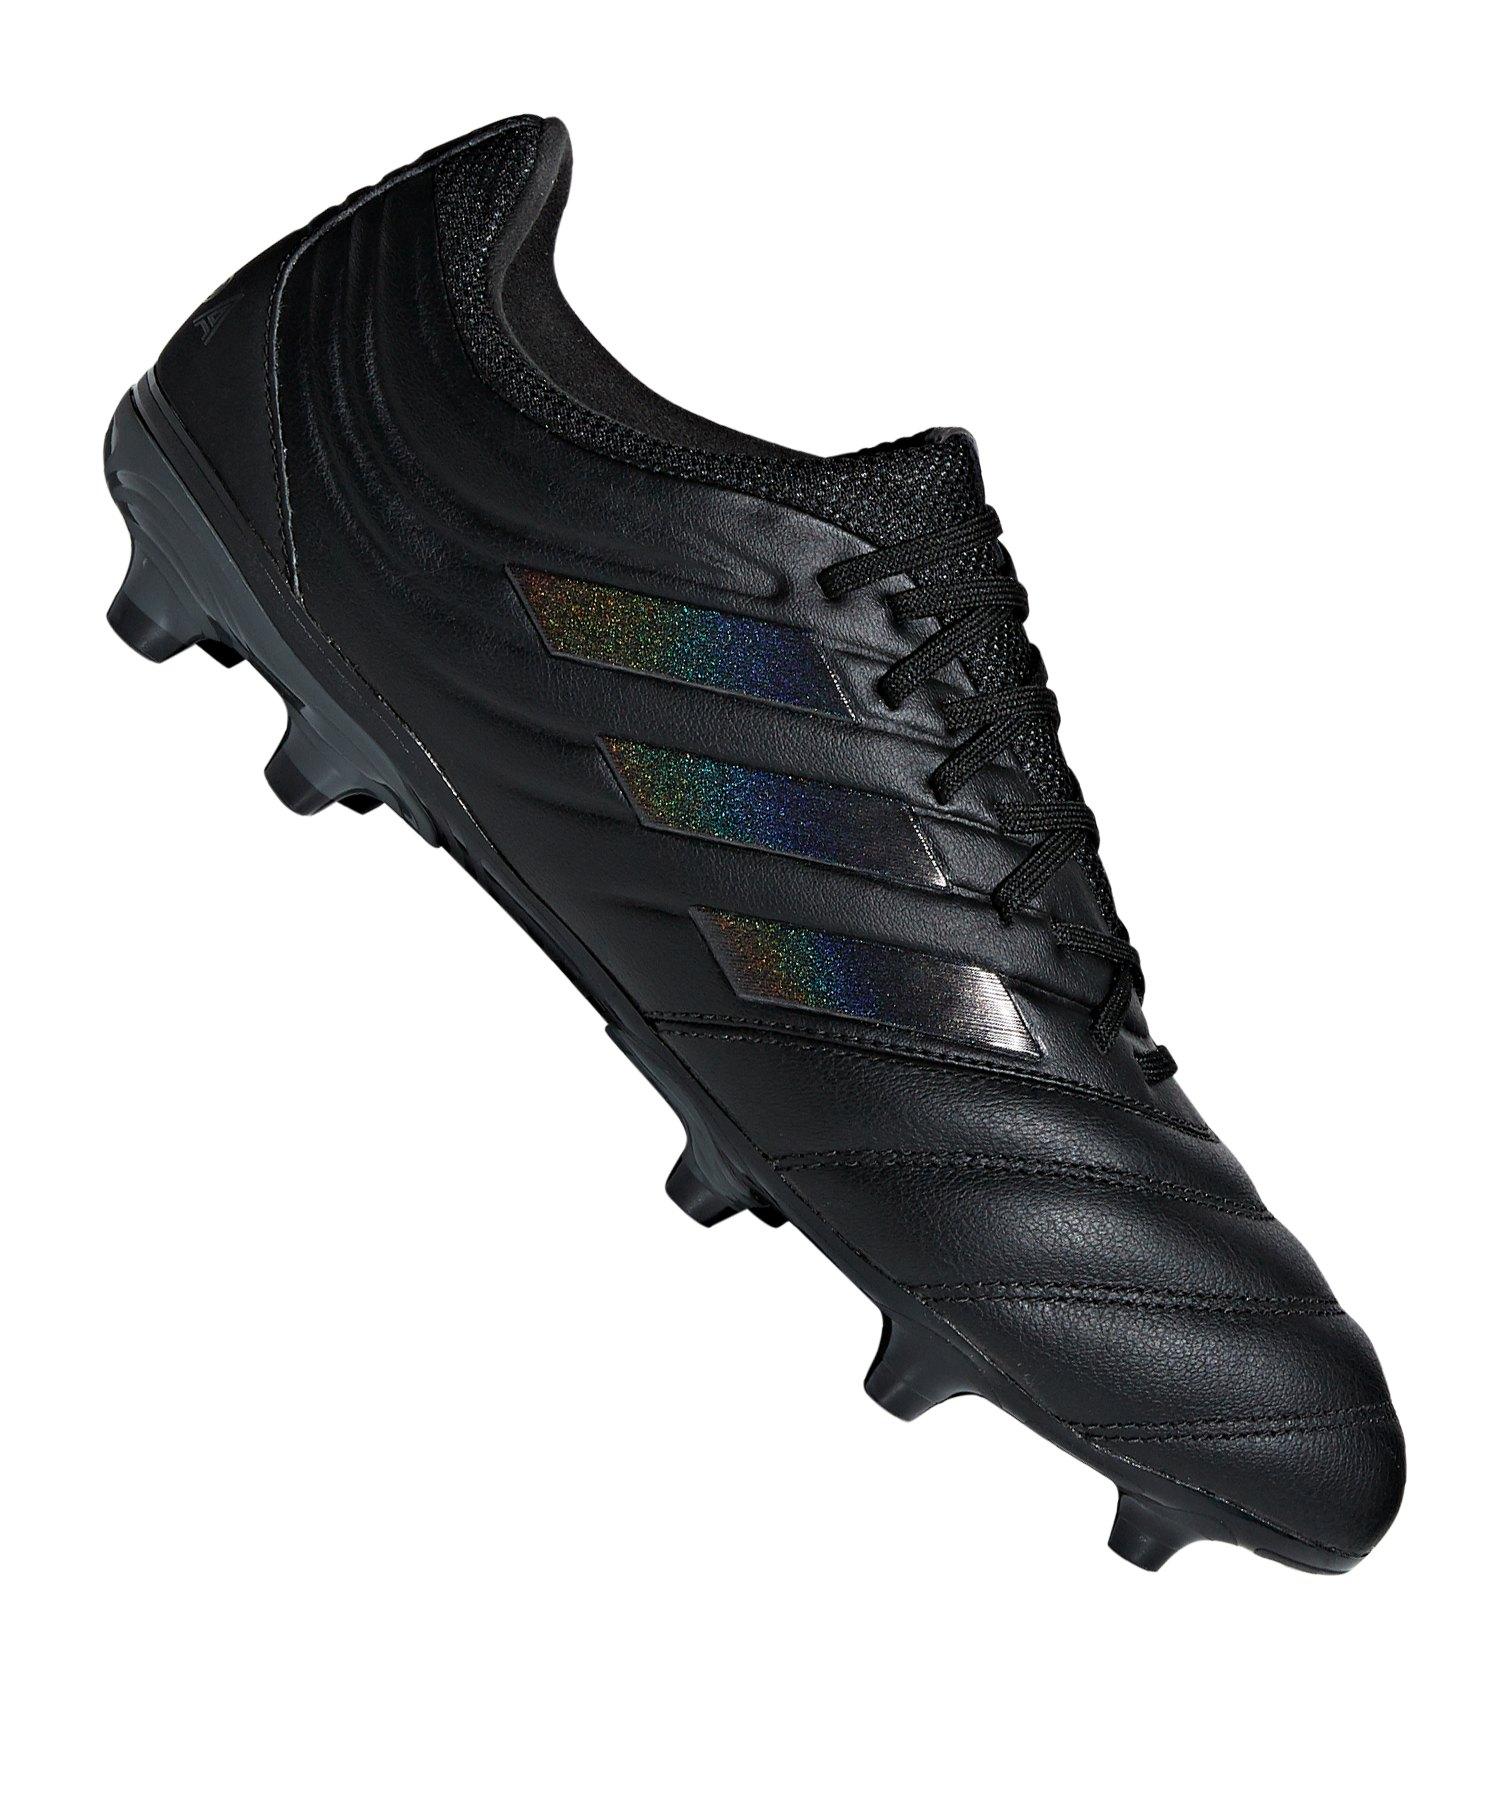 adidas COPA 19.3 FG Schwarz - schwarz